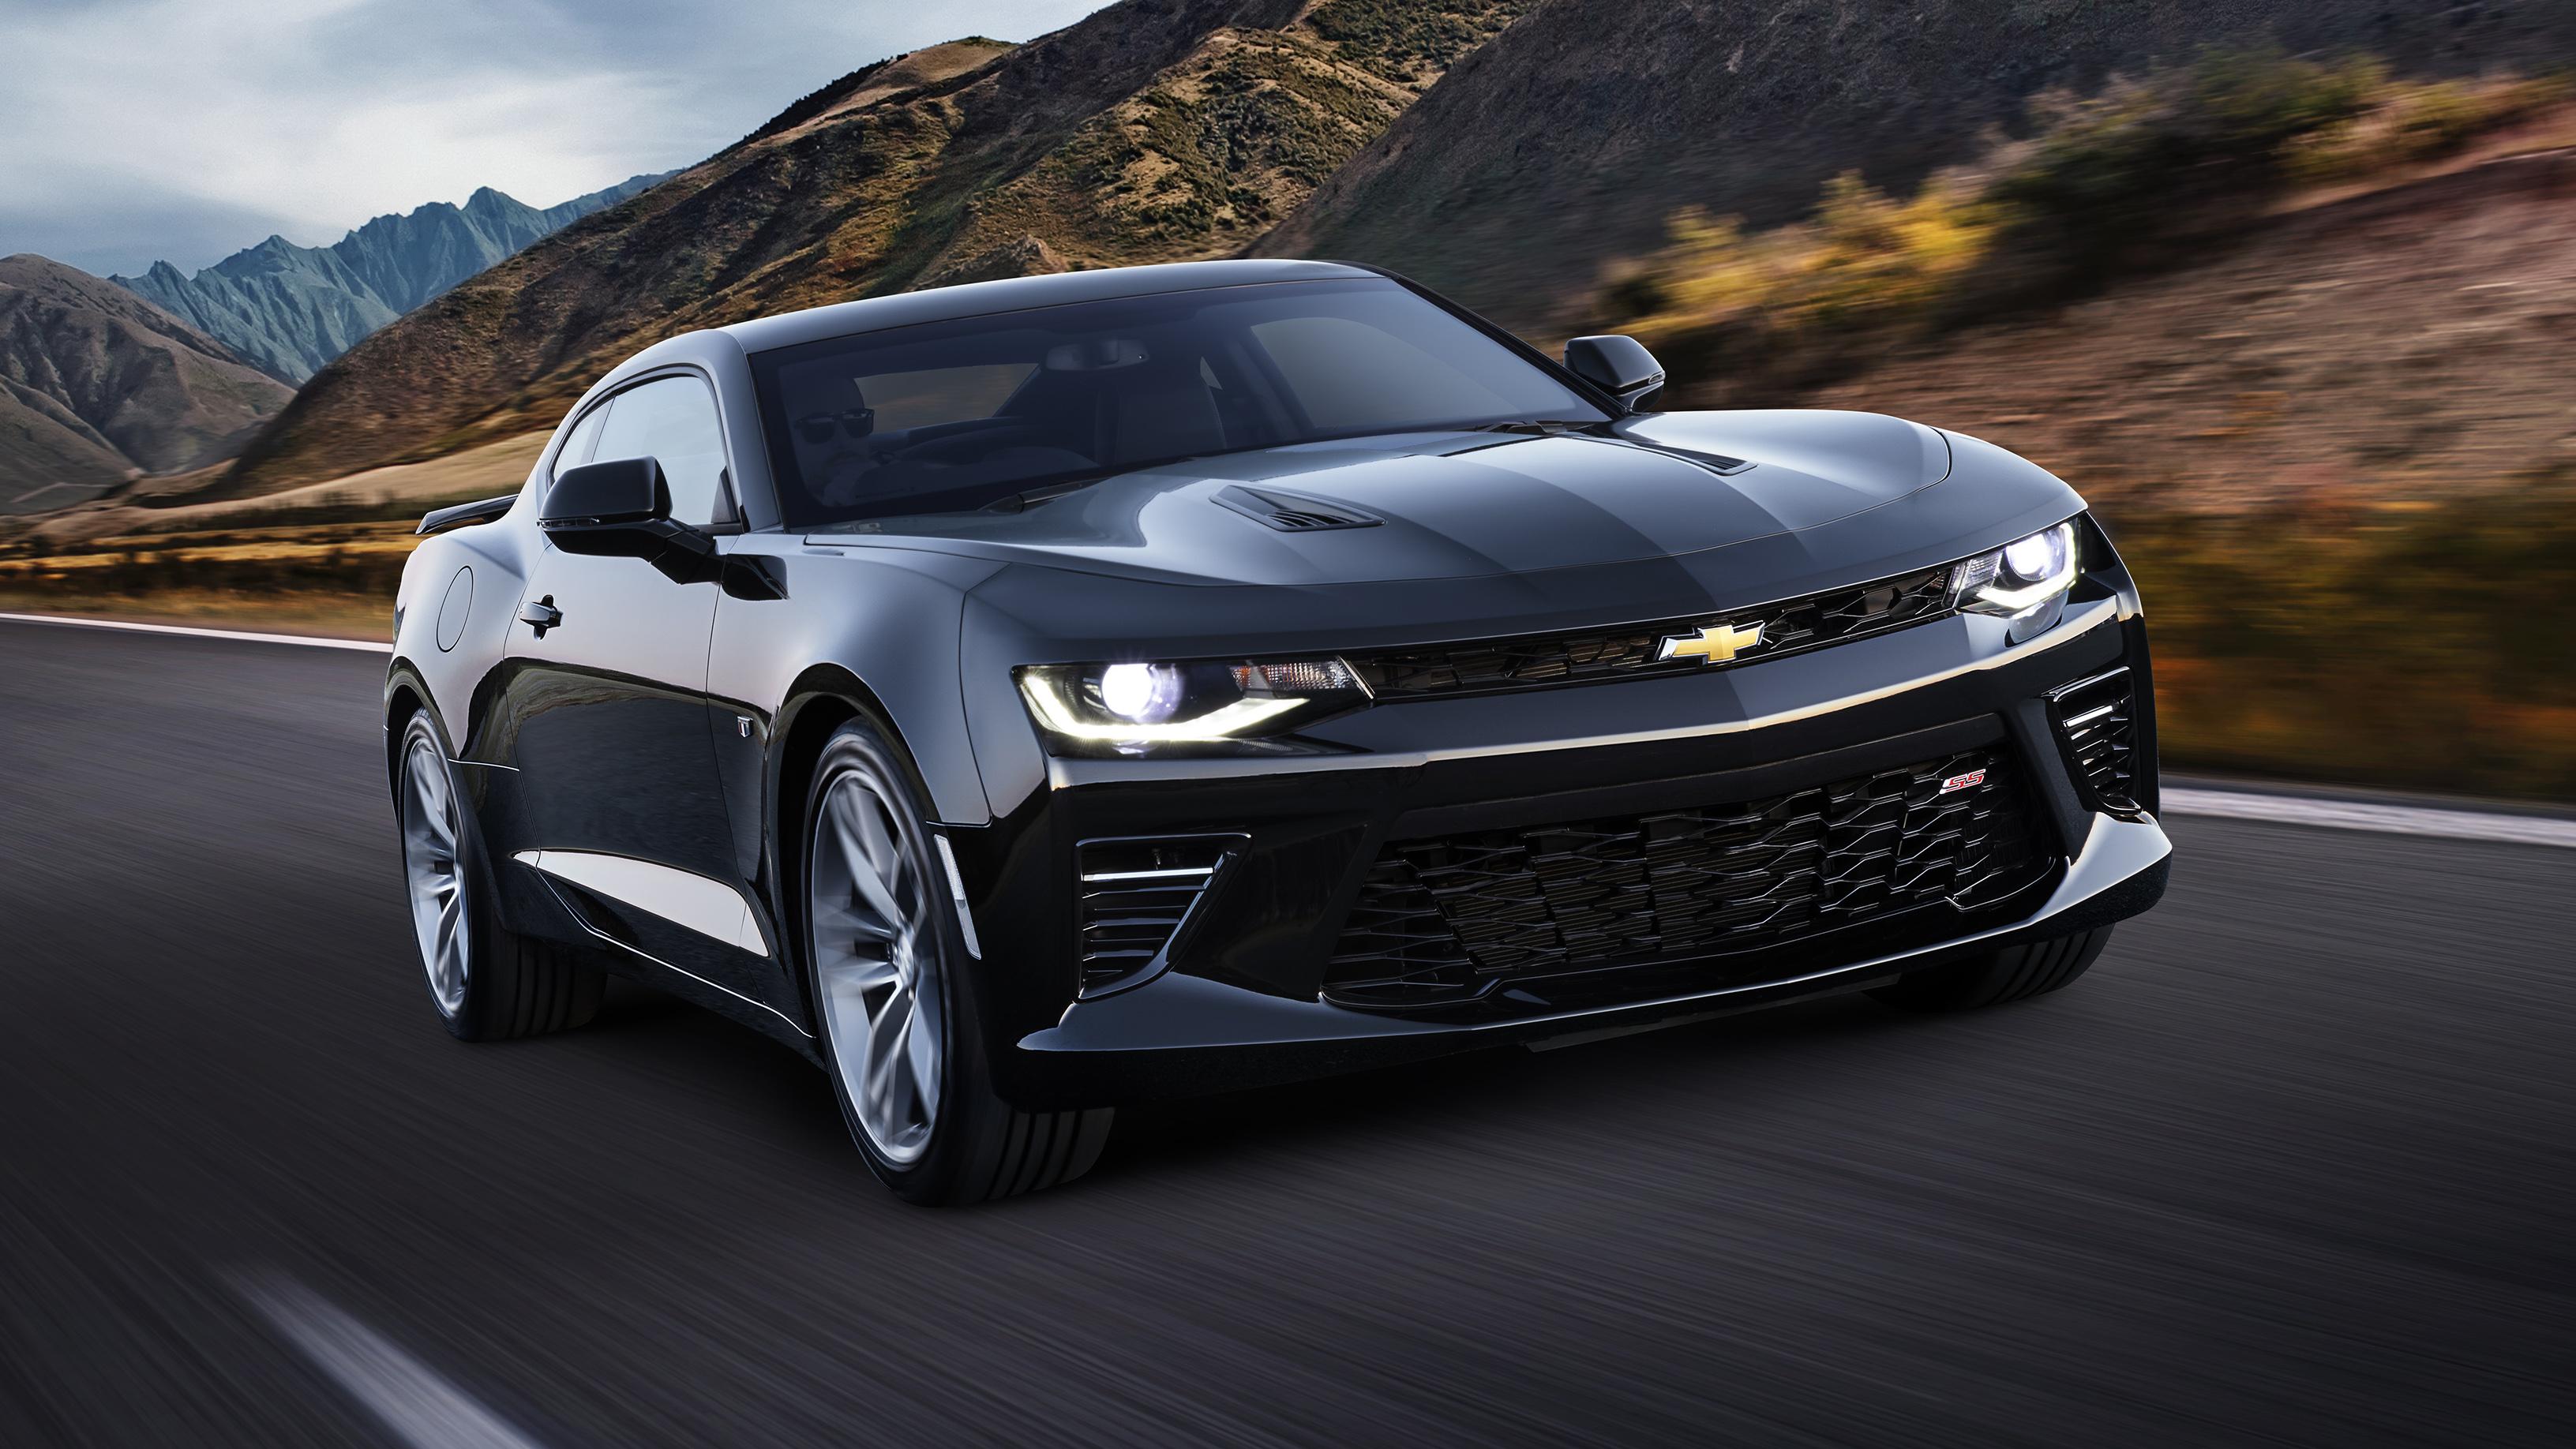 2020 camaro ss 6.2 horsepower